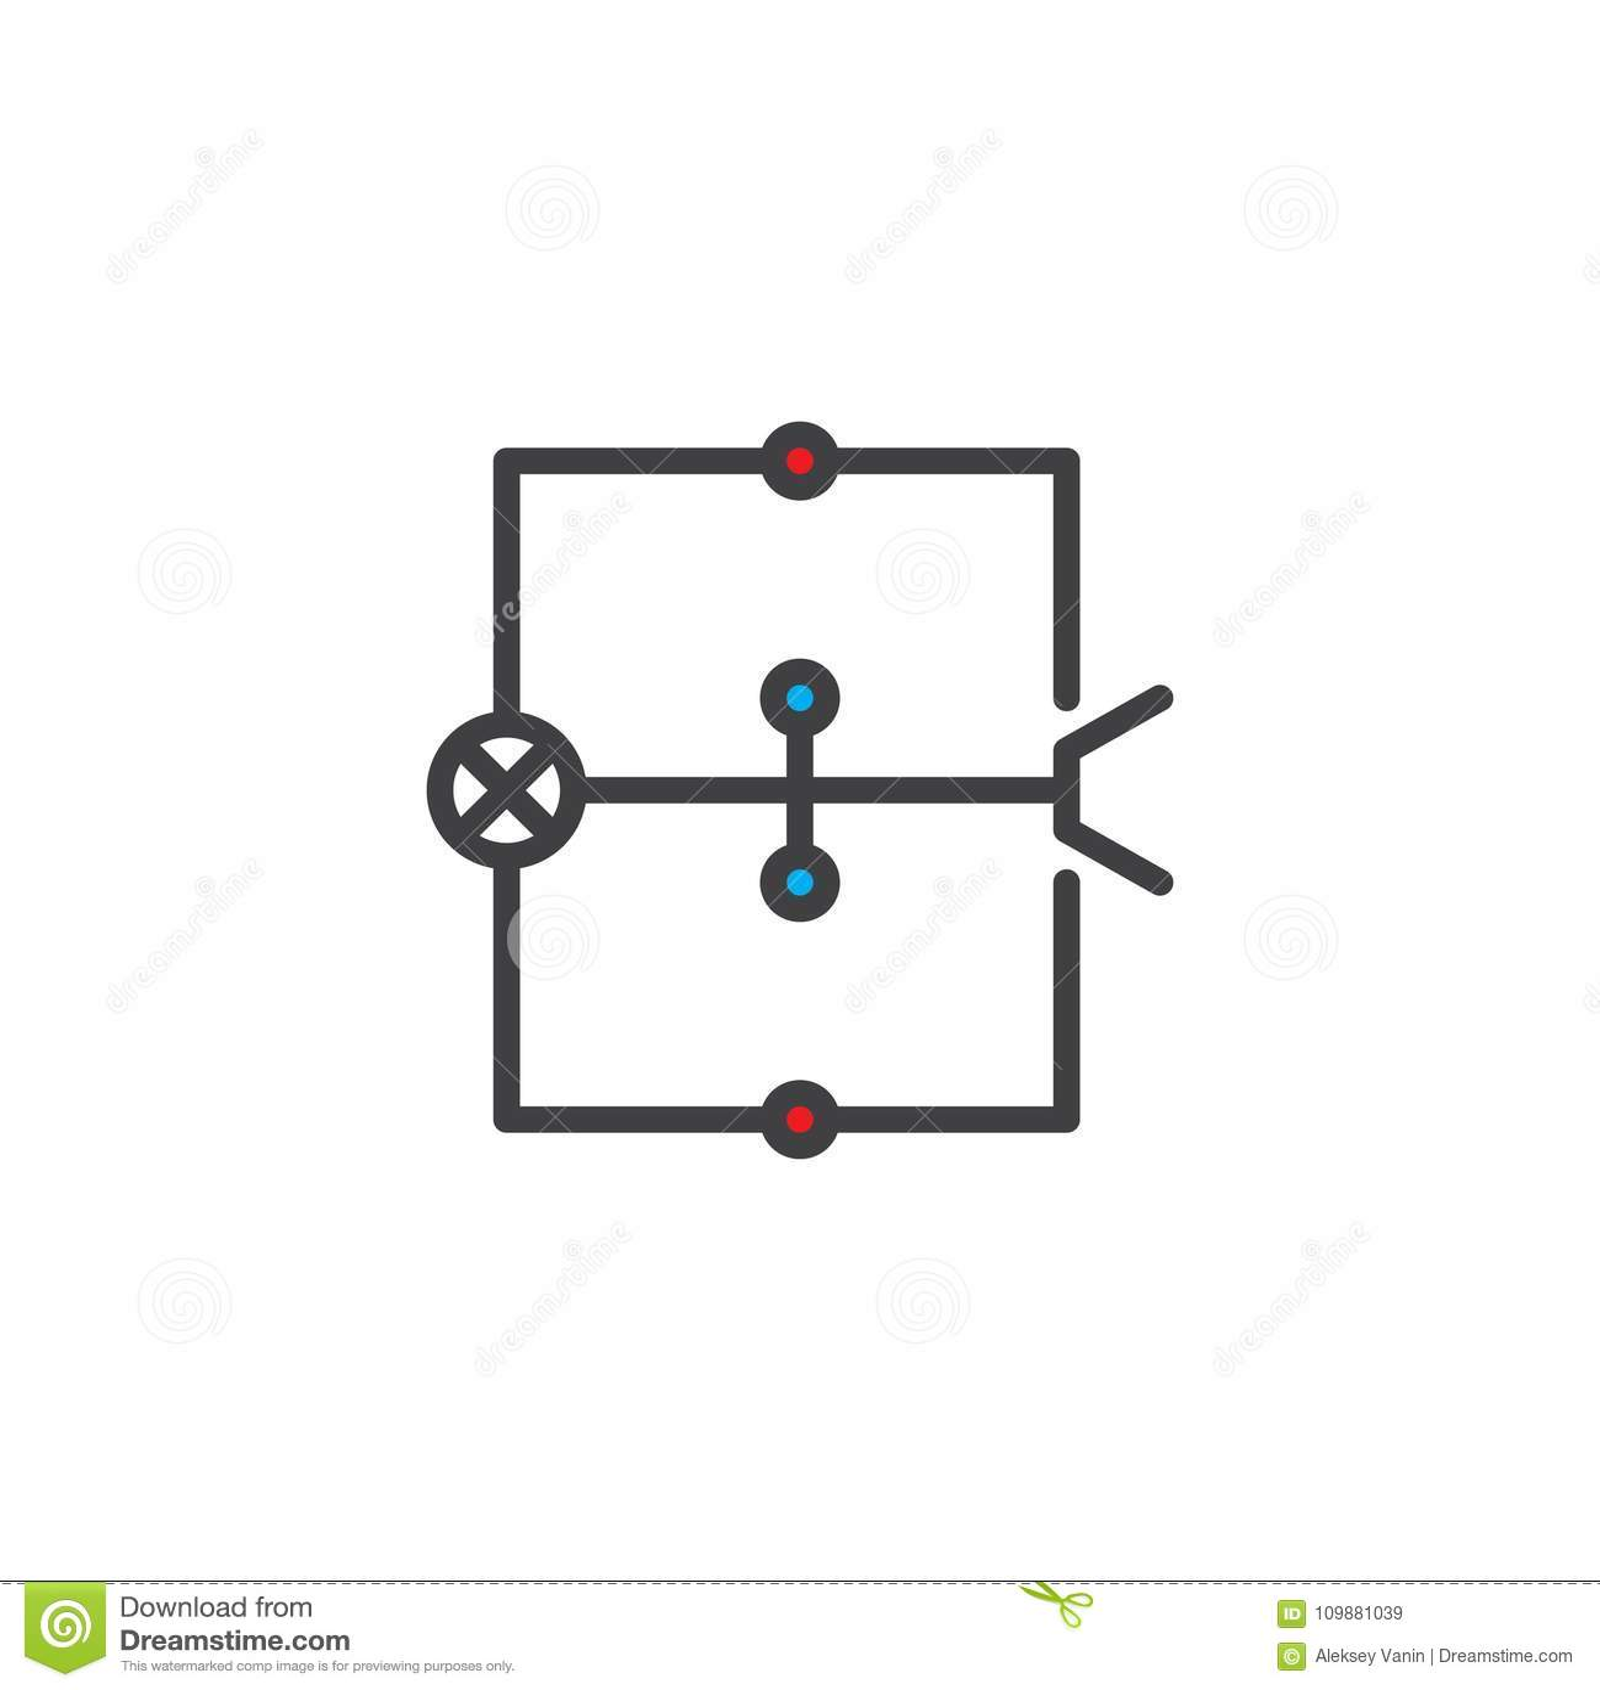 wiring diagram filled outline icon stock vector. Black Bedroom Furniture Sets. Home Design Ideas